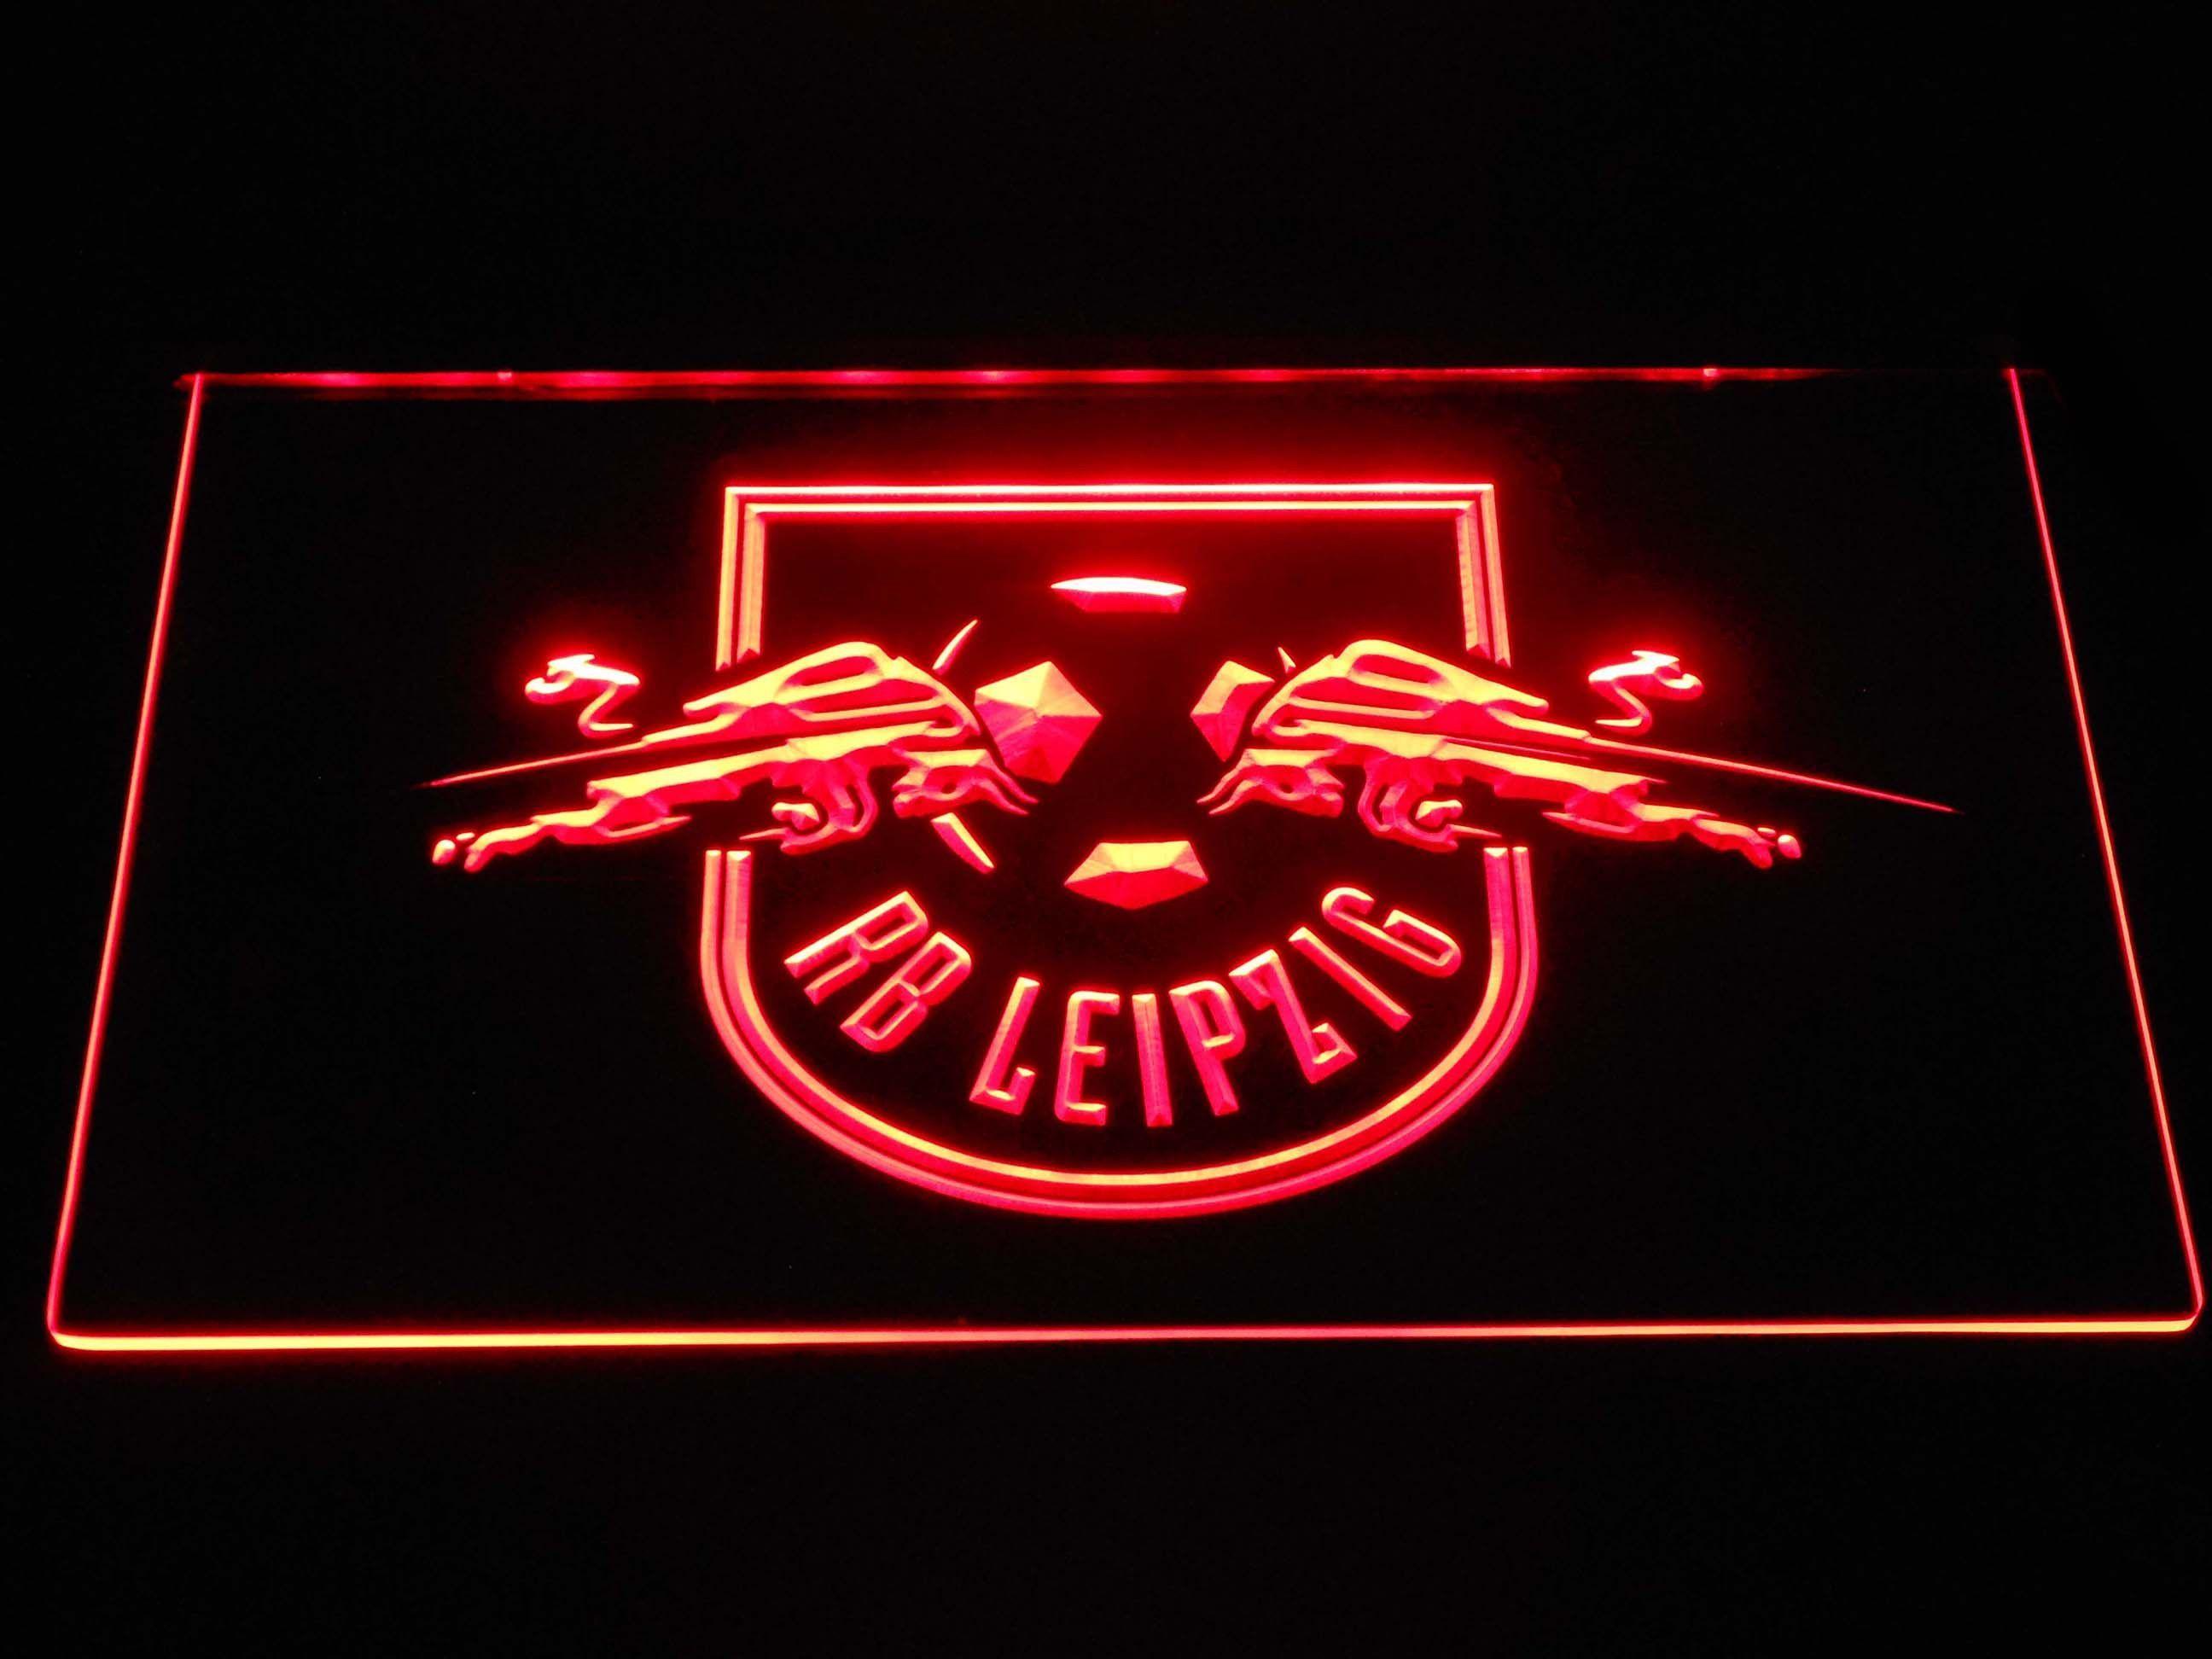 RB Leipzig LED Neon Sign